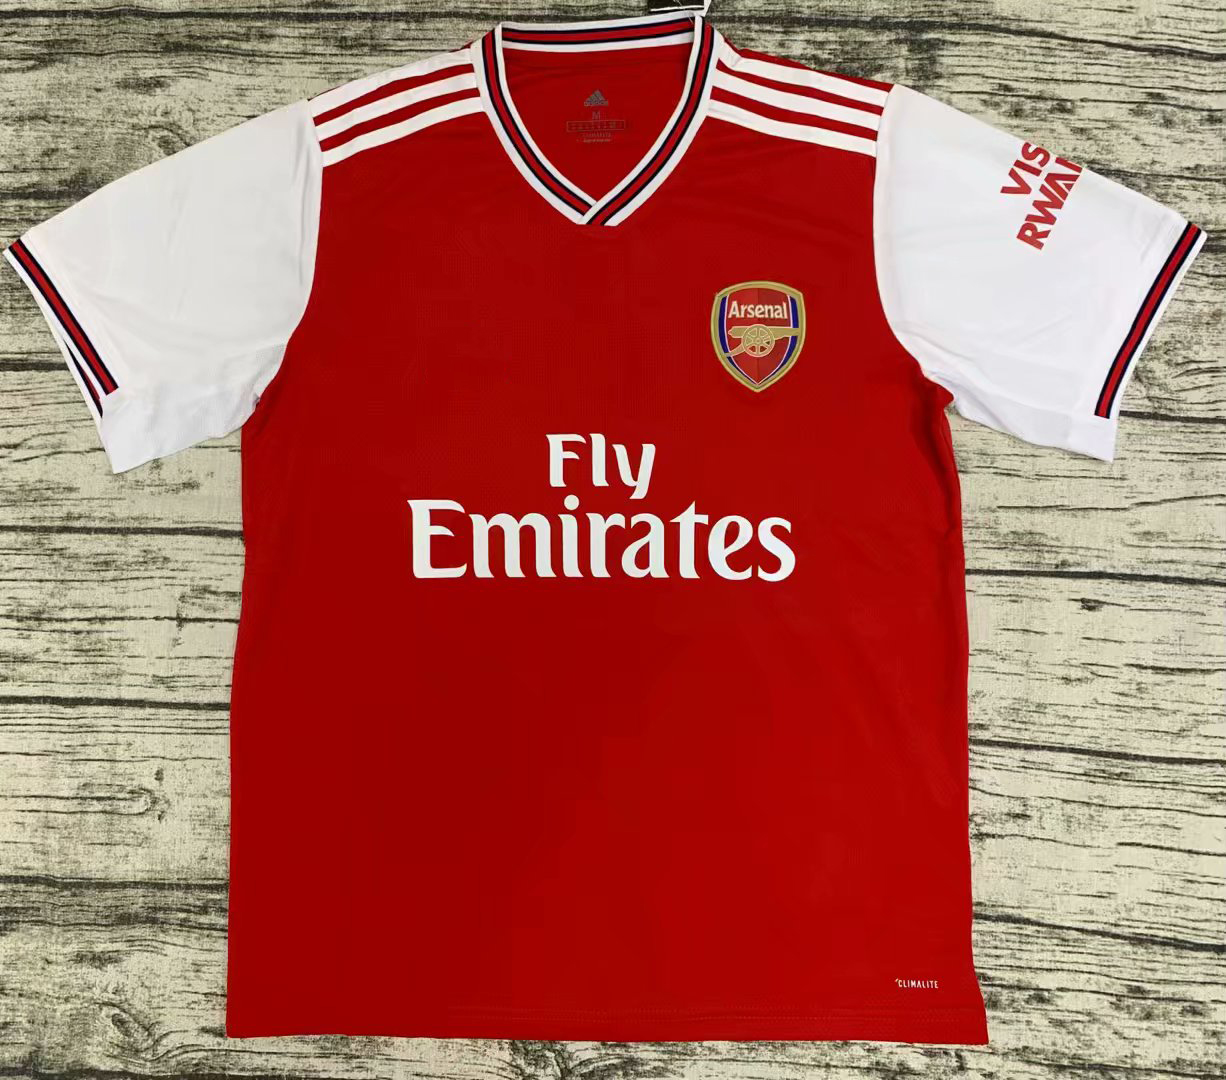 2019/2020 season Arsenal home soccer jerseys new Thai version shirt jersey men's soccer clothing custom name and number